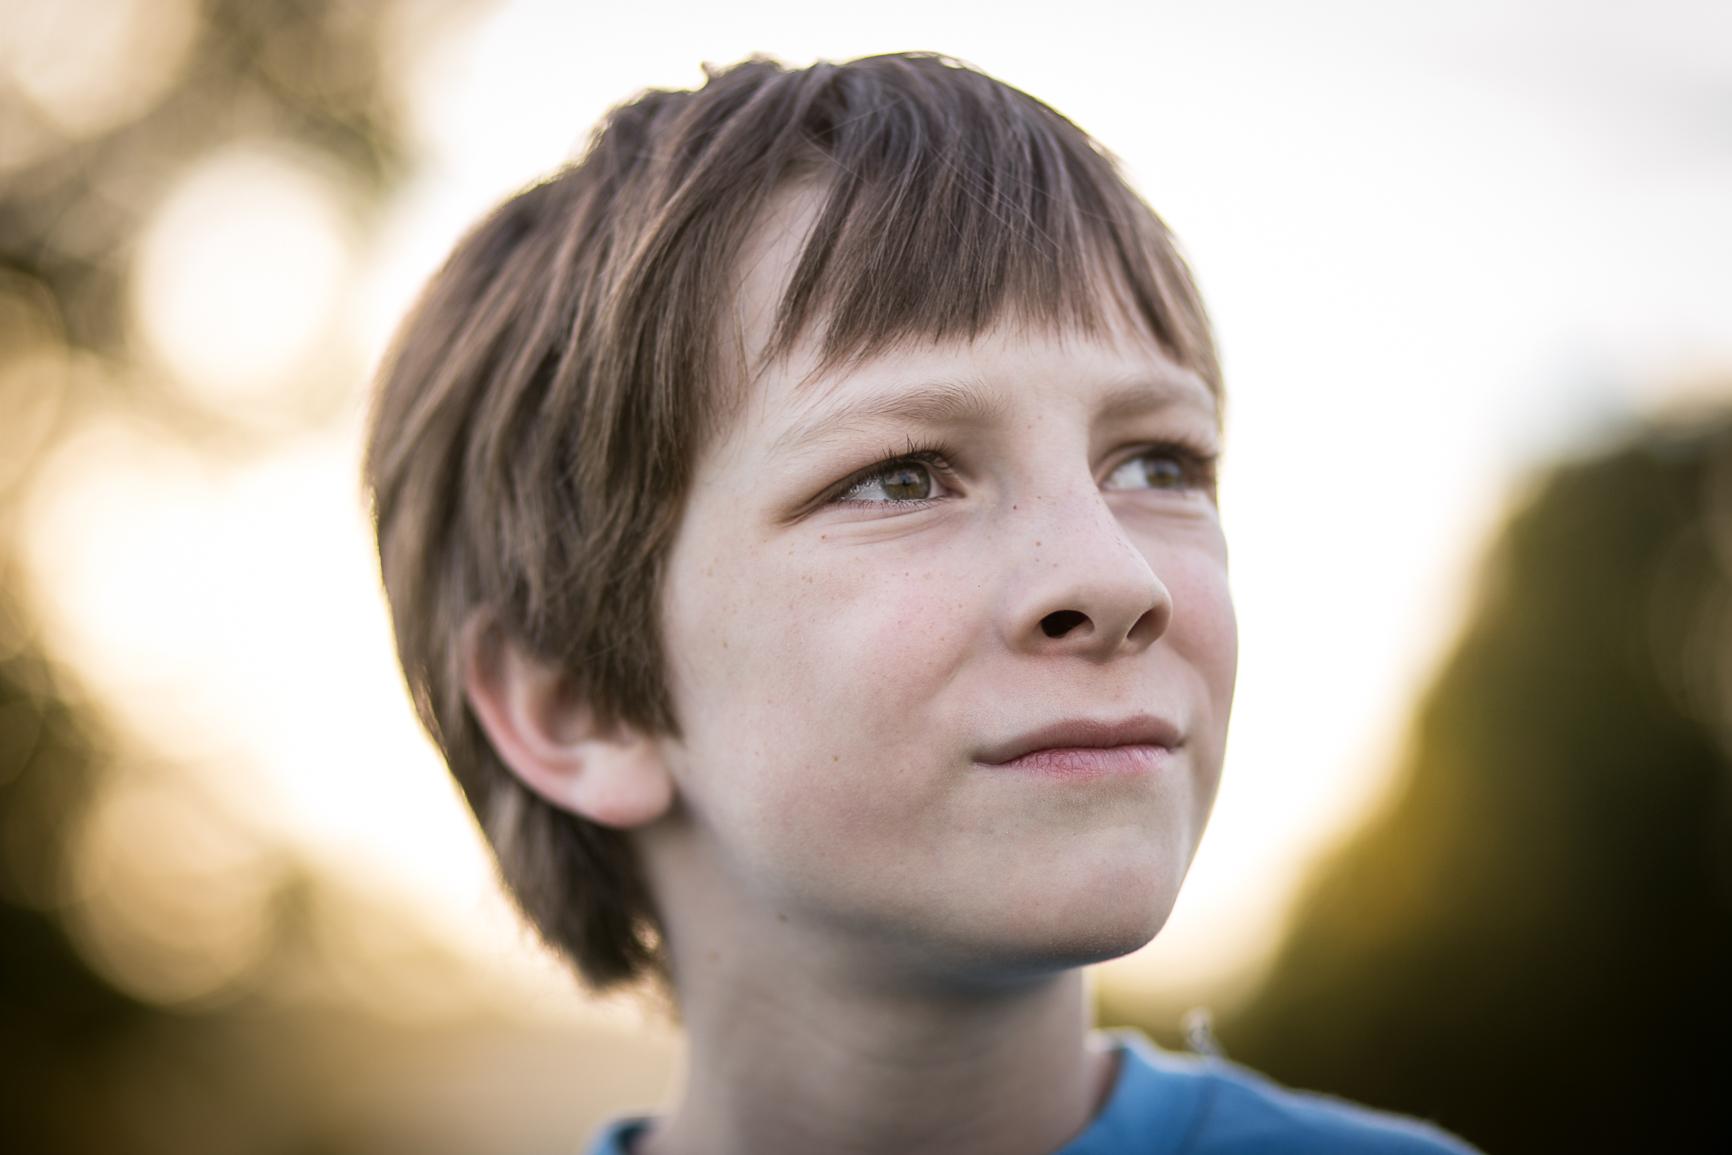 eight year old boy